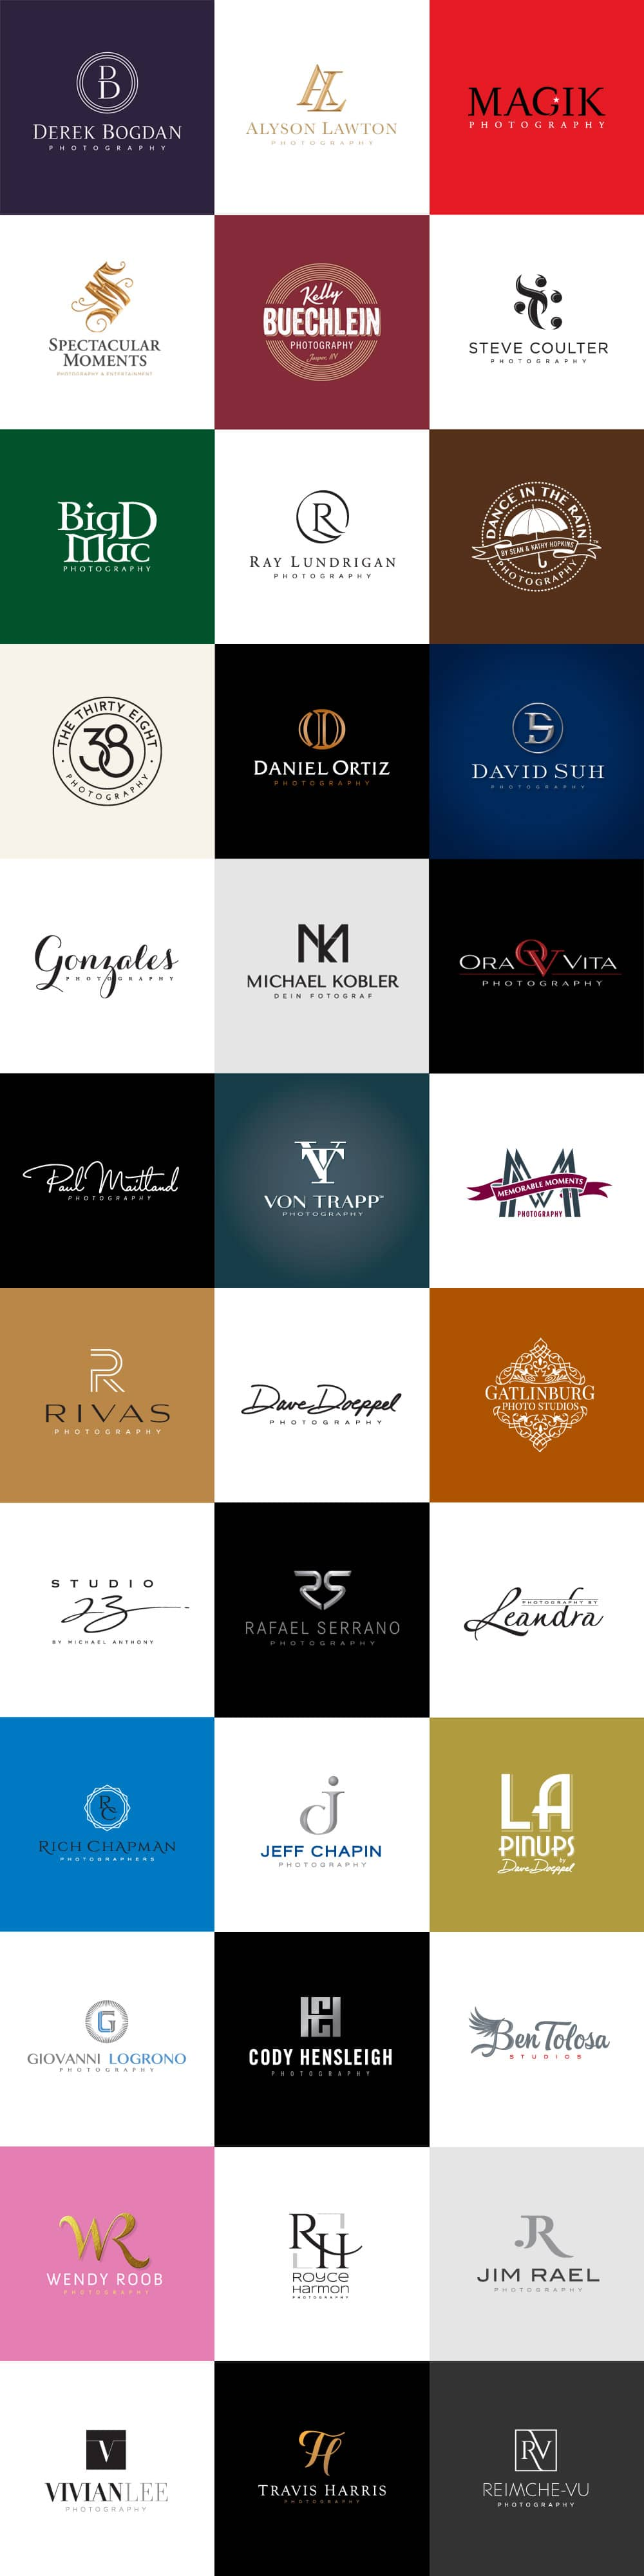 photographers logo designs